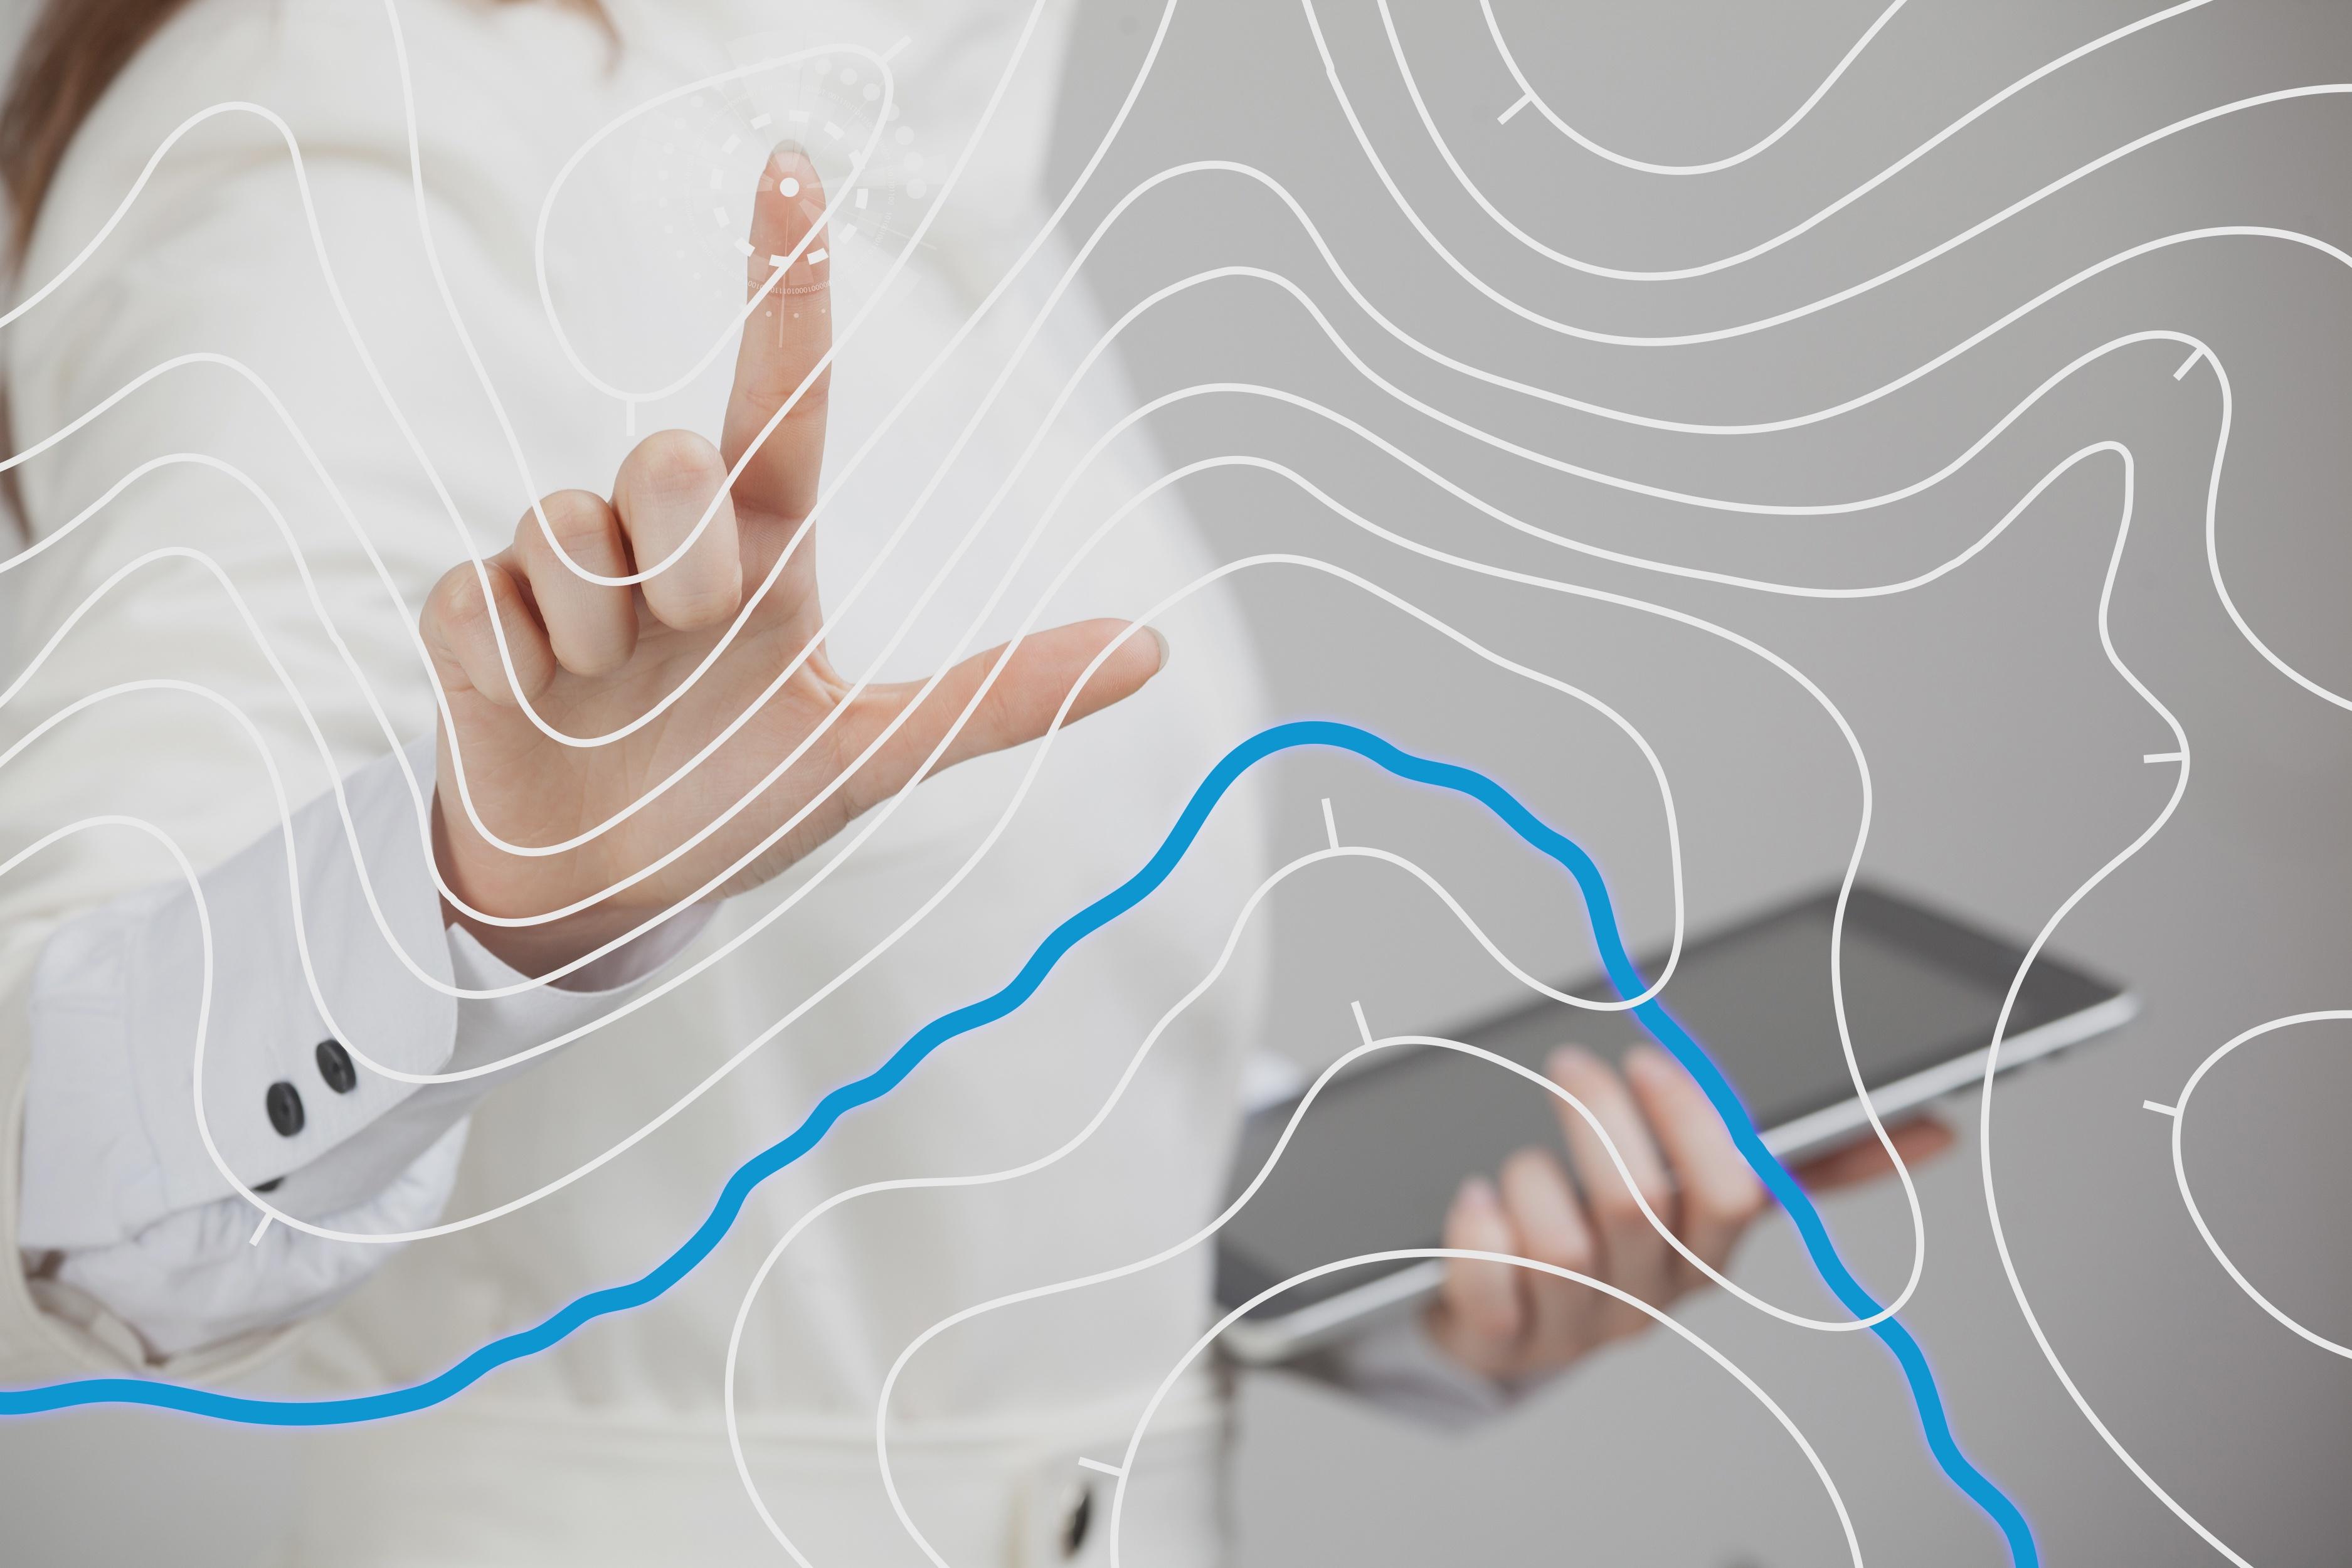 Cohesive solutions Maximo Spatial Esri GIS ArcGIS services Maximo Spatial Implementation Cohesive Solutions GIS Services